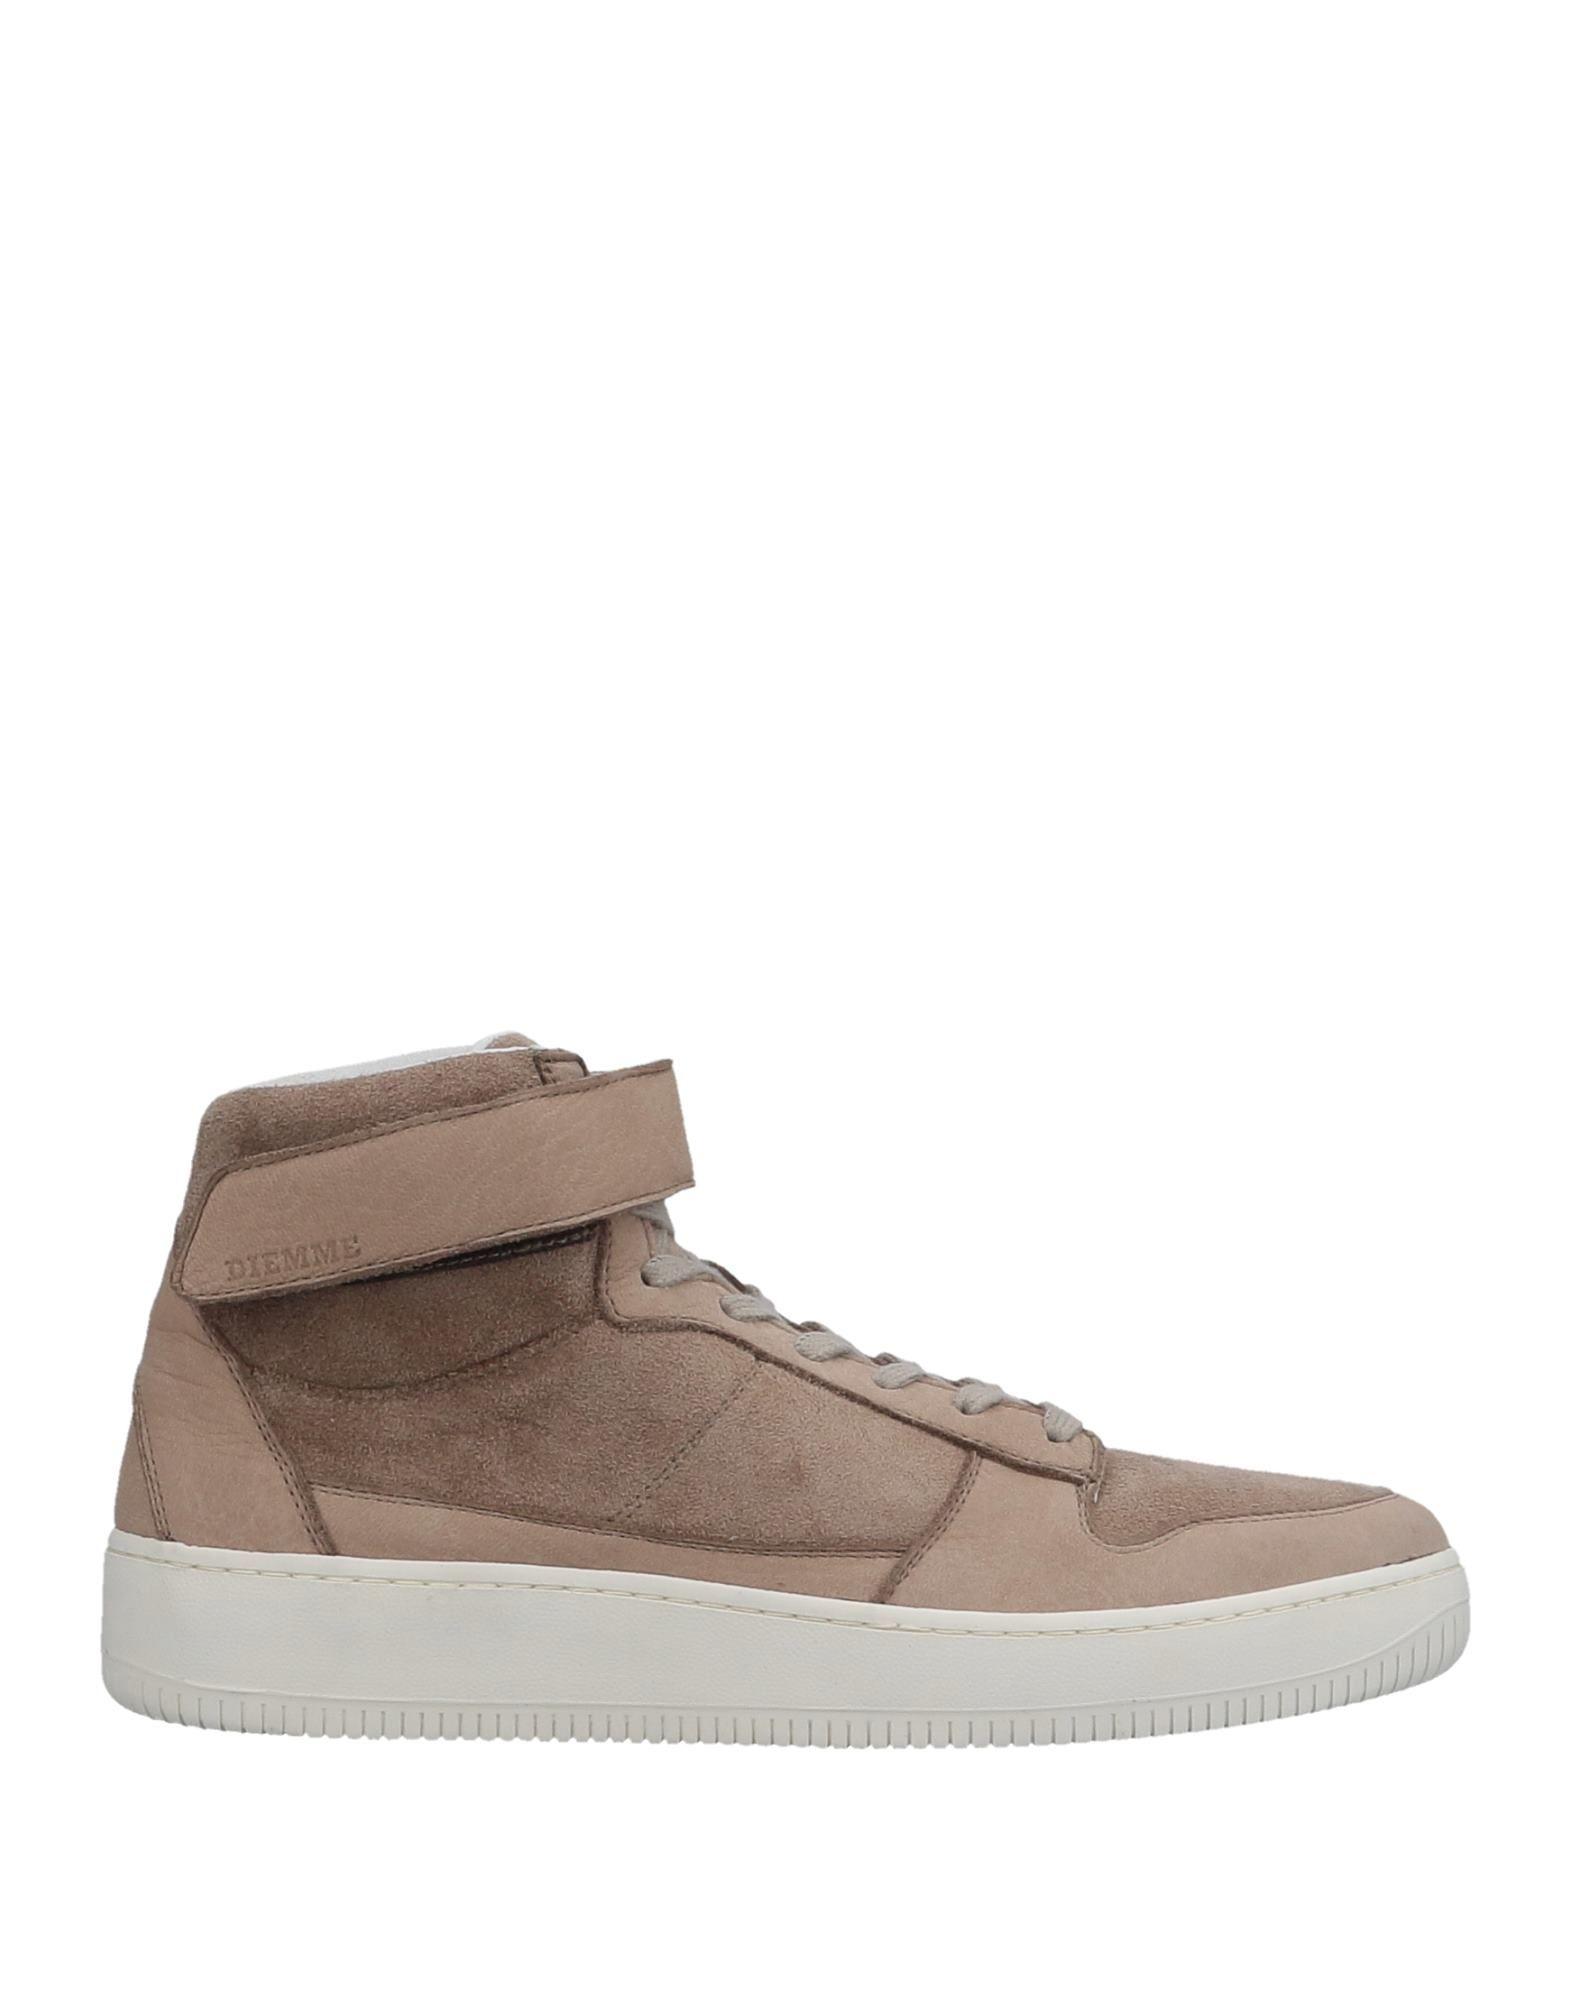 Diemme Sneakers Herren  11500557JU Gute Qualität beliebte Schuhe